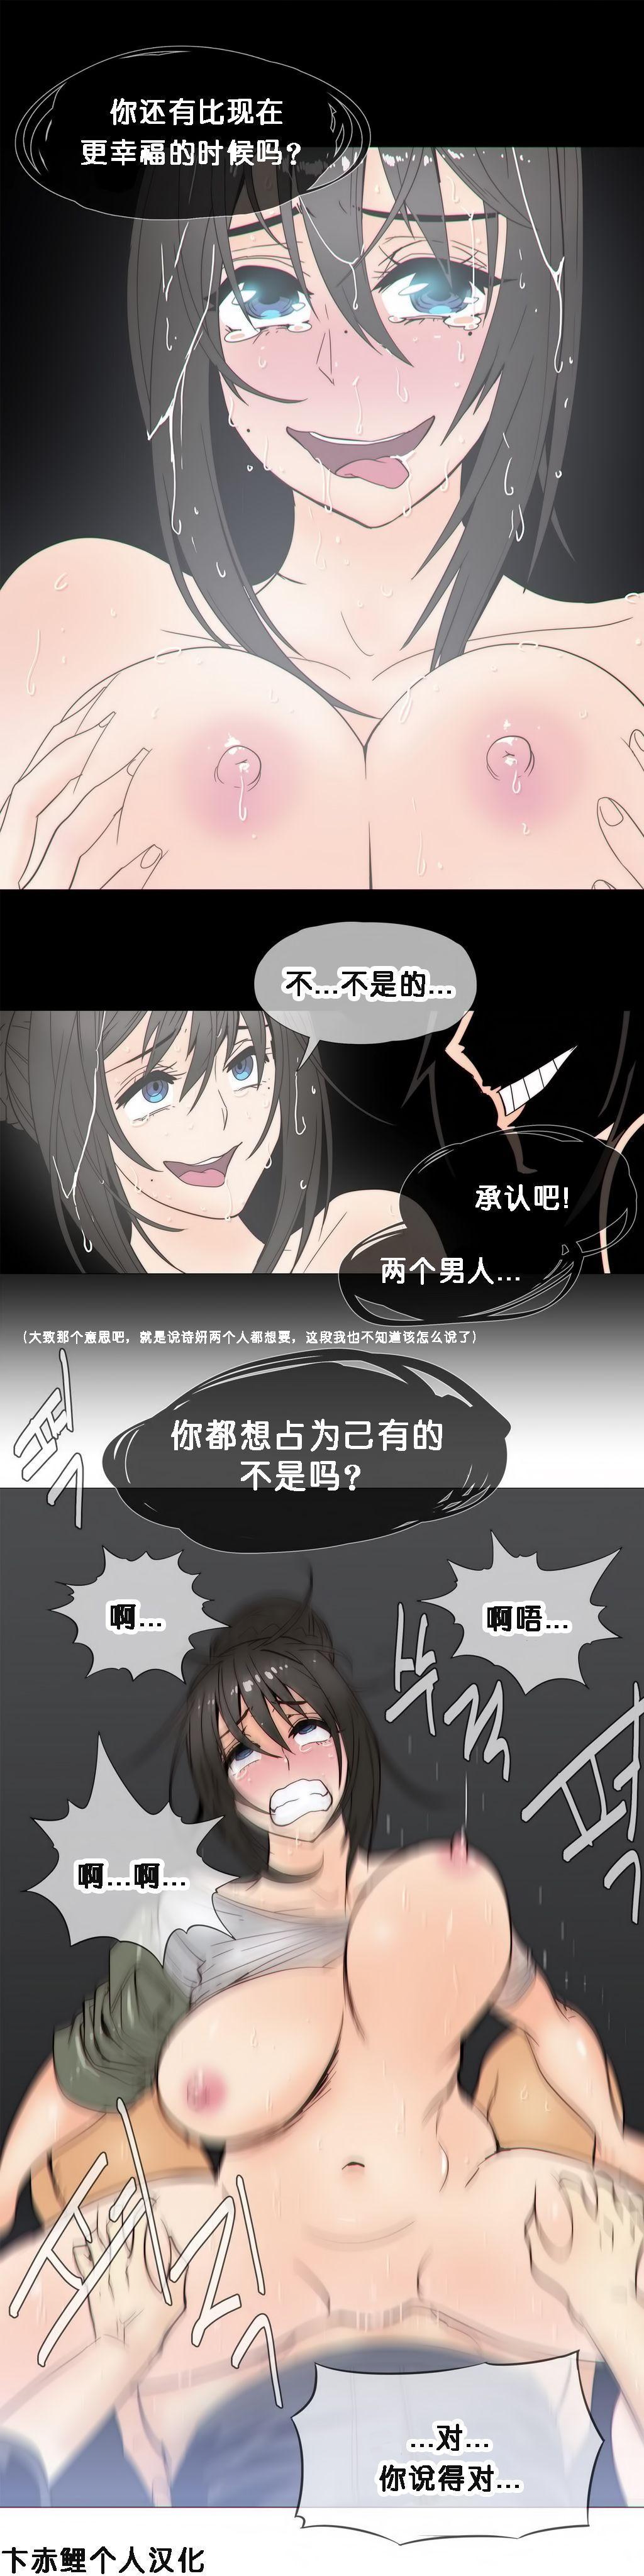 HouseHold Affairs 【卞赤鲤个人汉化】1~33话(持续更新中) 486